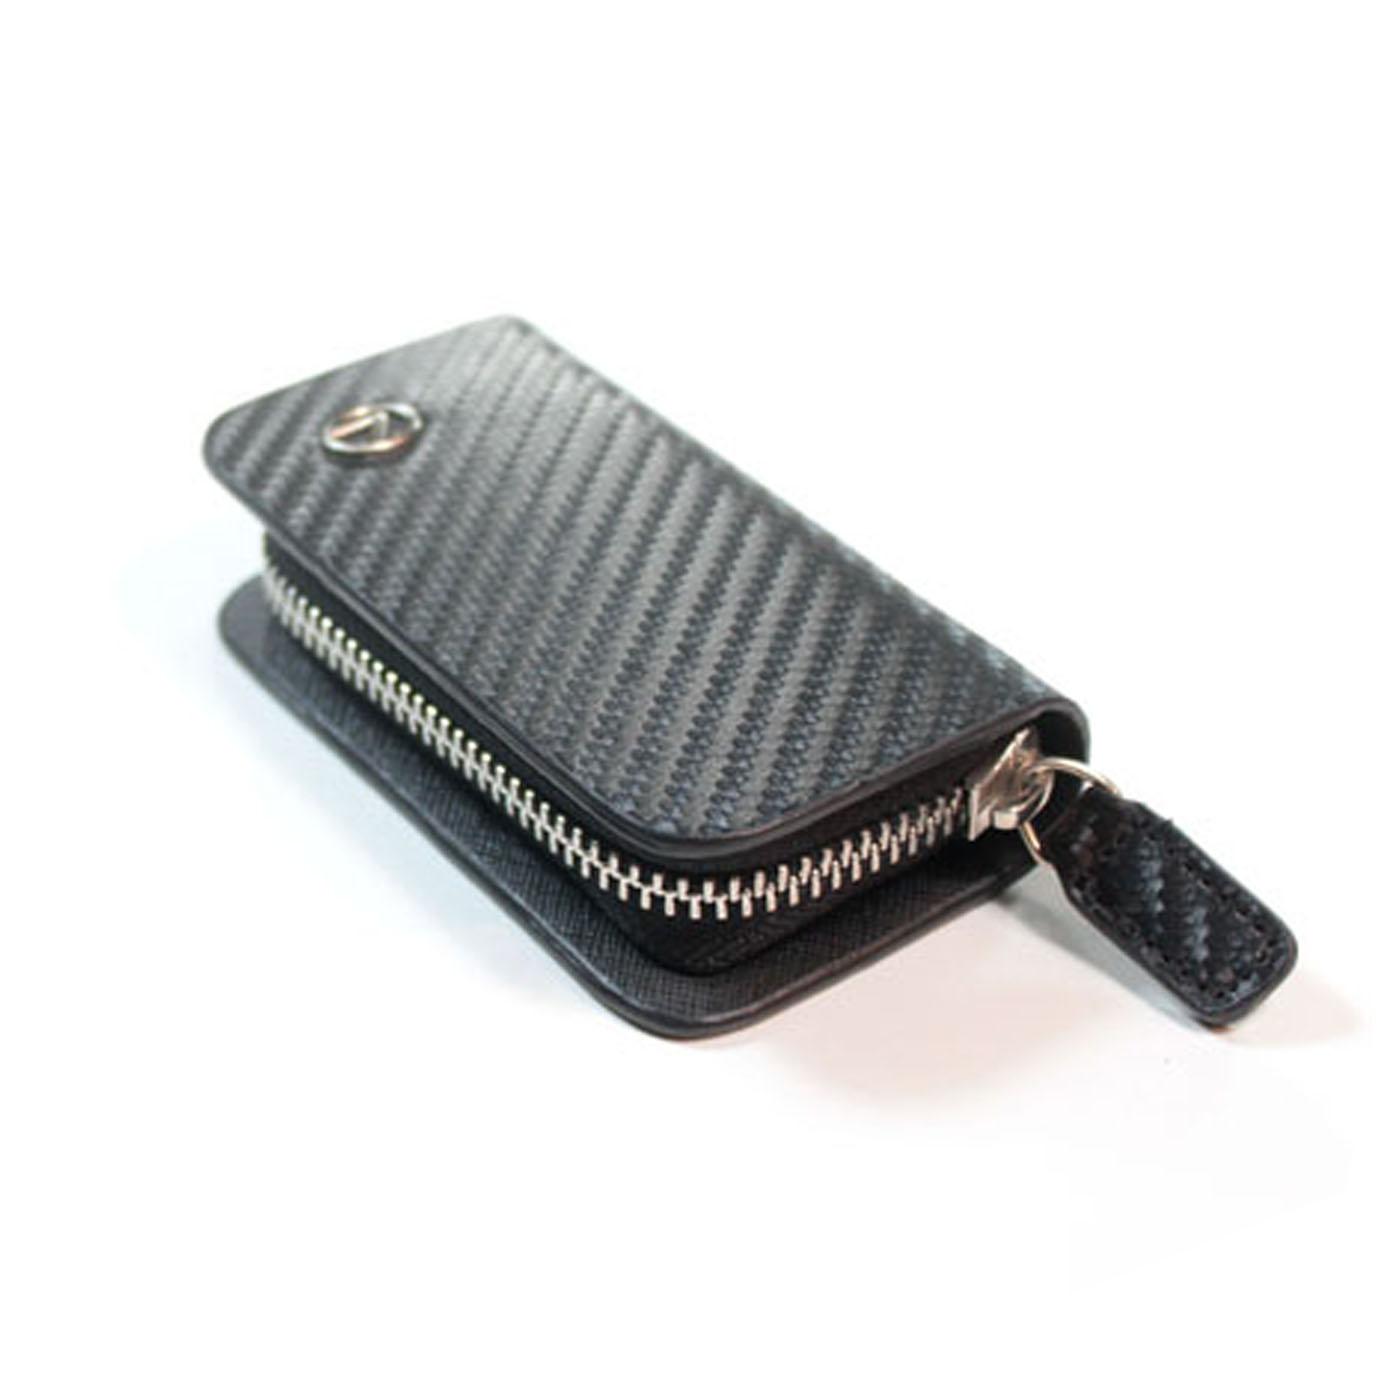 Lexus 凌志 真牛皮 尊爵系列遙控皮套 黑色汽車鑰匙包款 車鑰匙扣 零錢包